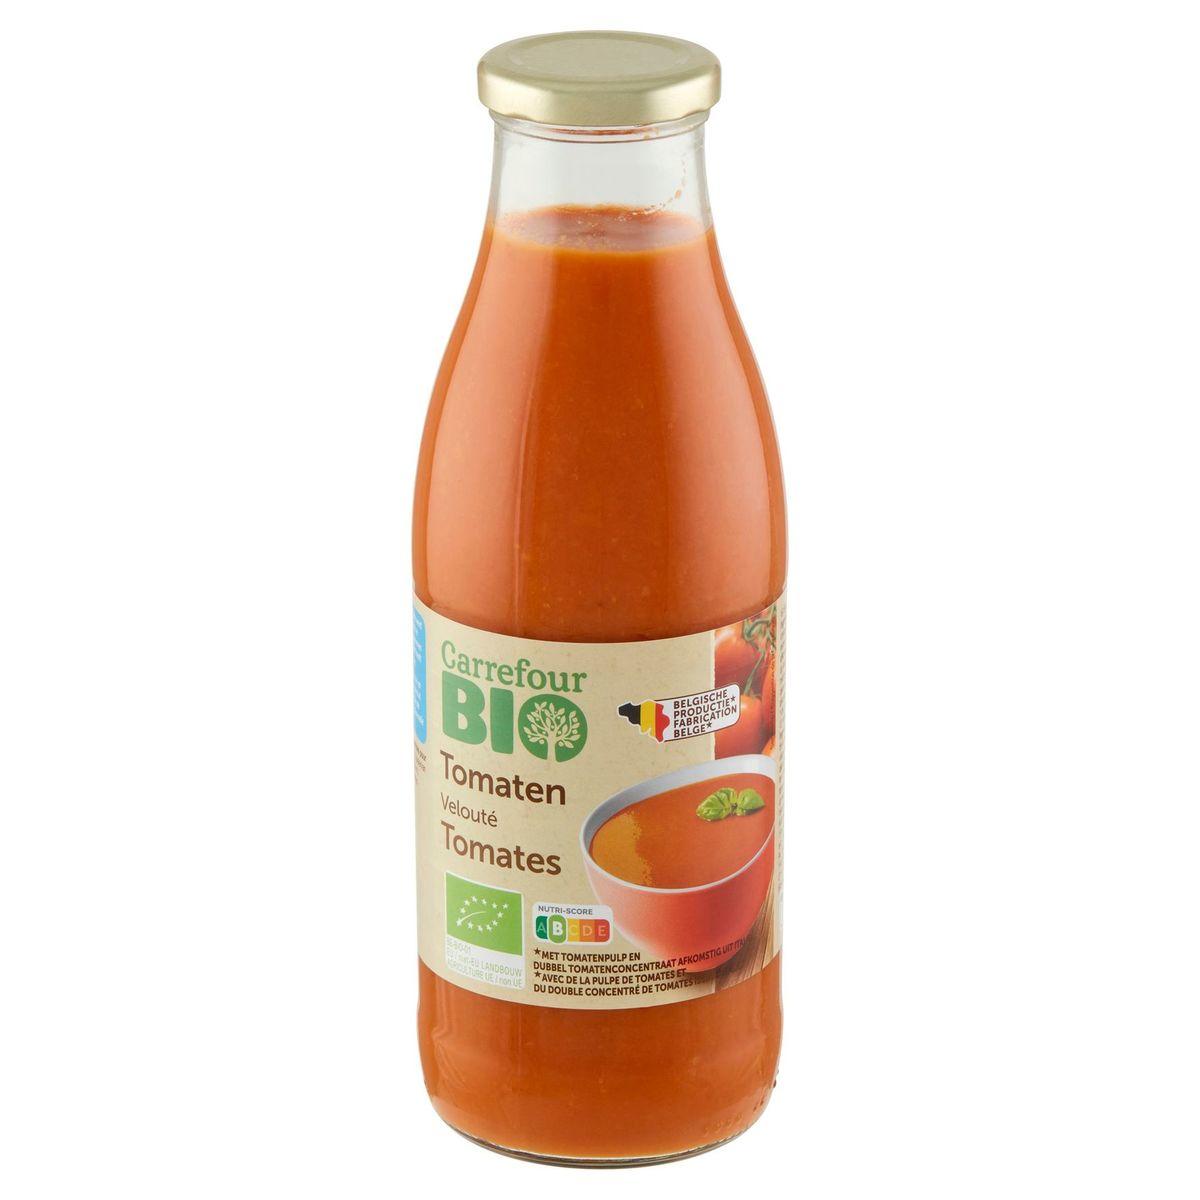 Carrefour Bio Tomaten Soep 730 ml